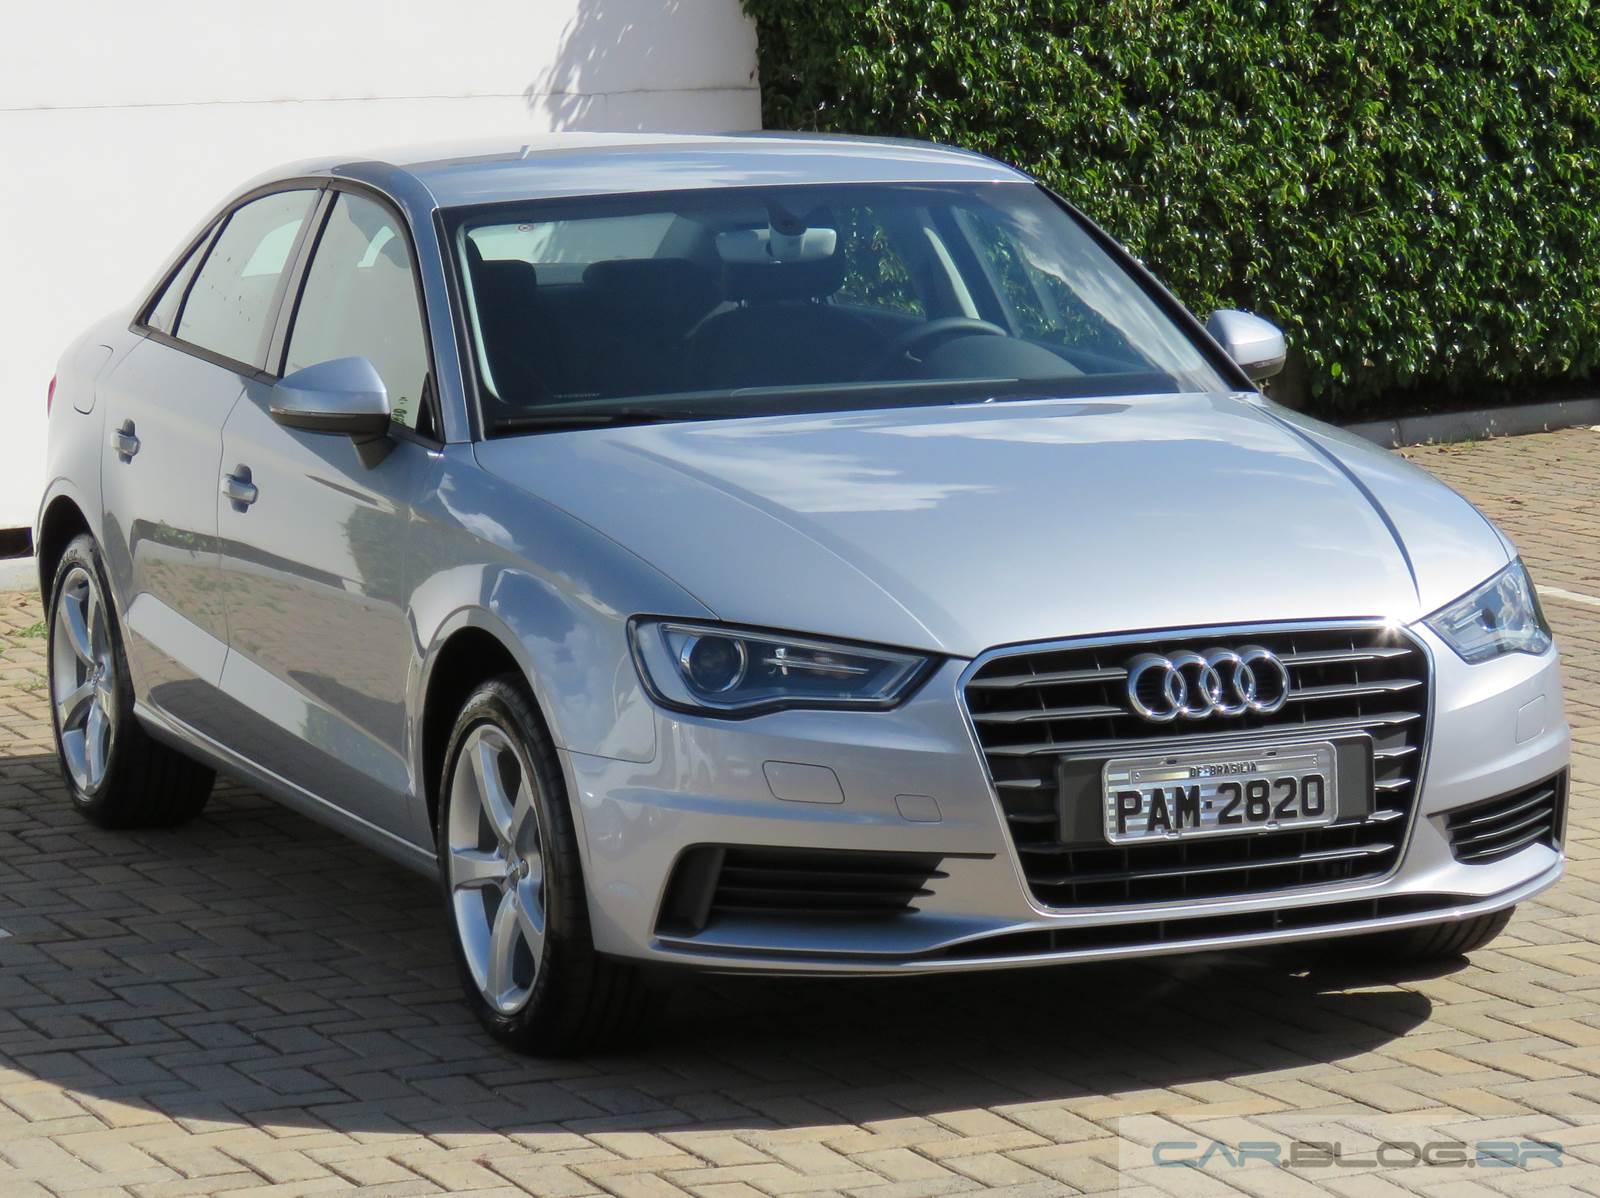 Audi A3 Sedan 1.4 Flex - Preço